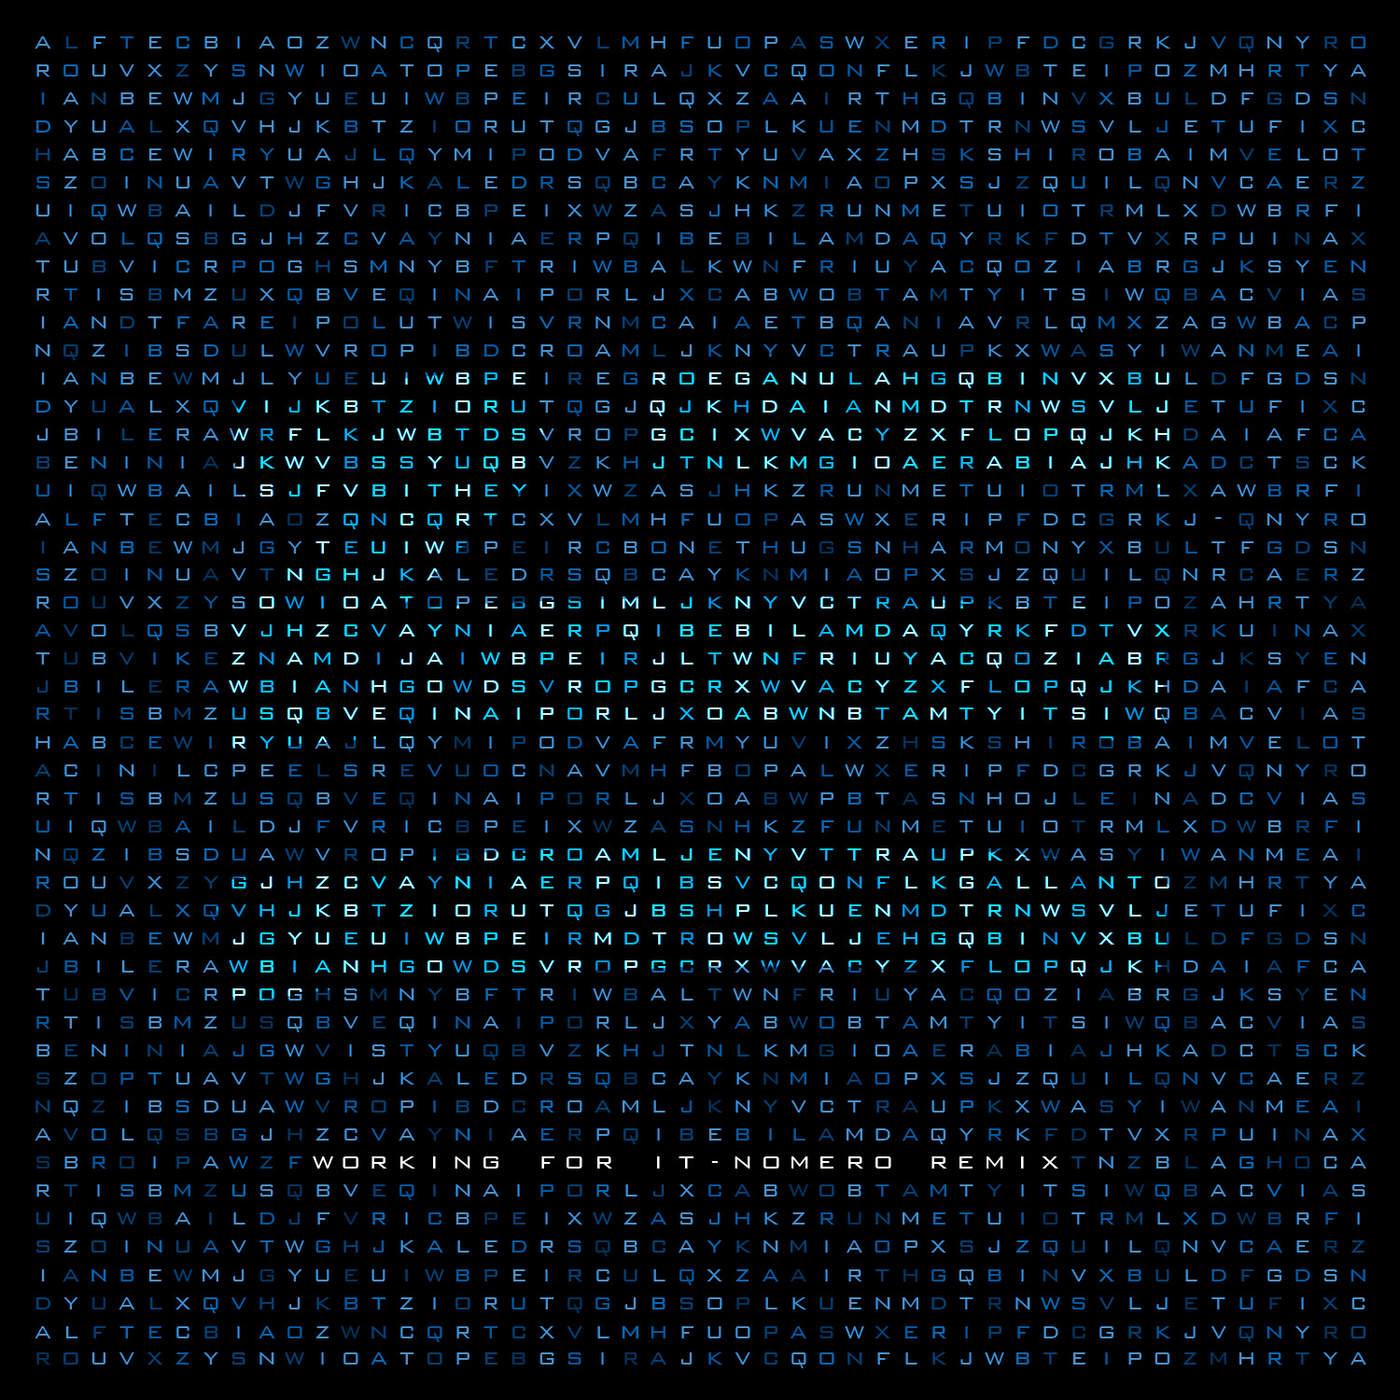 ZHU - Working for It (Nomero Remix) - Single Cover